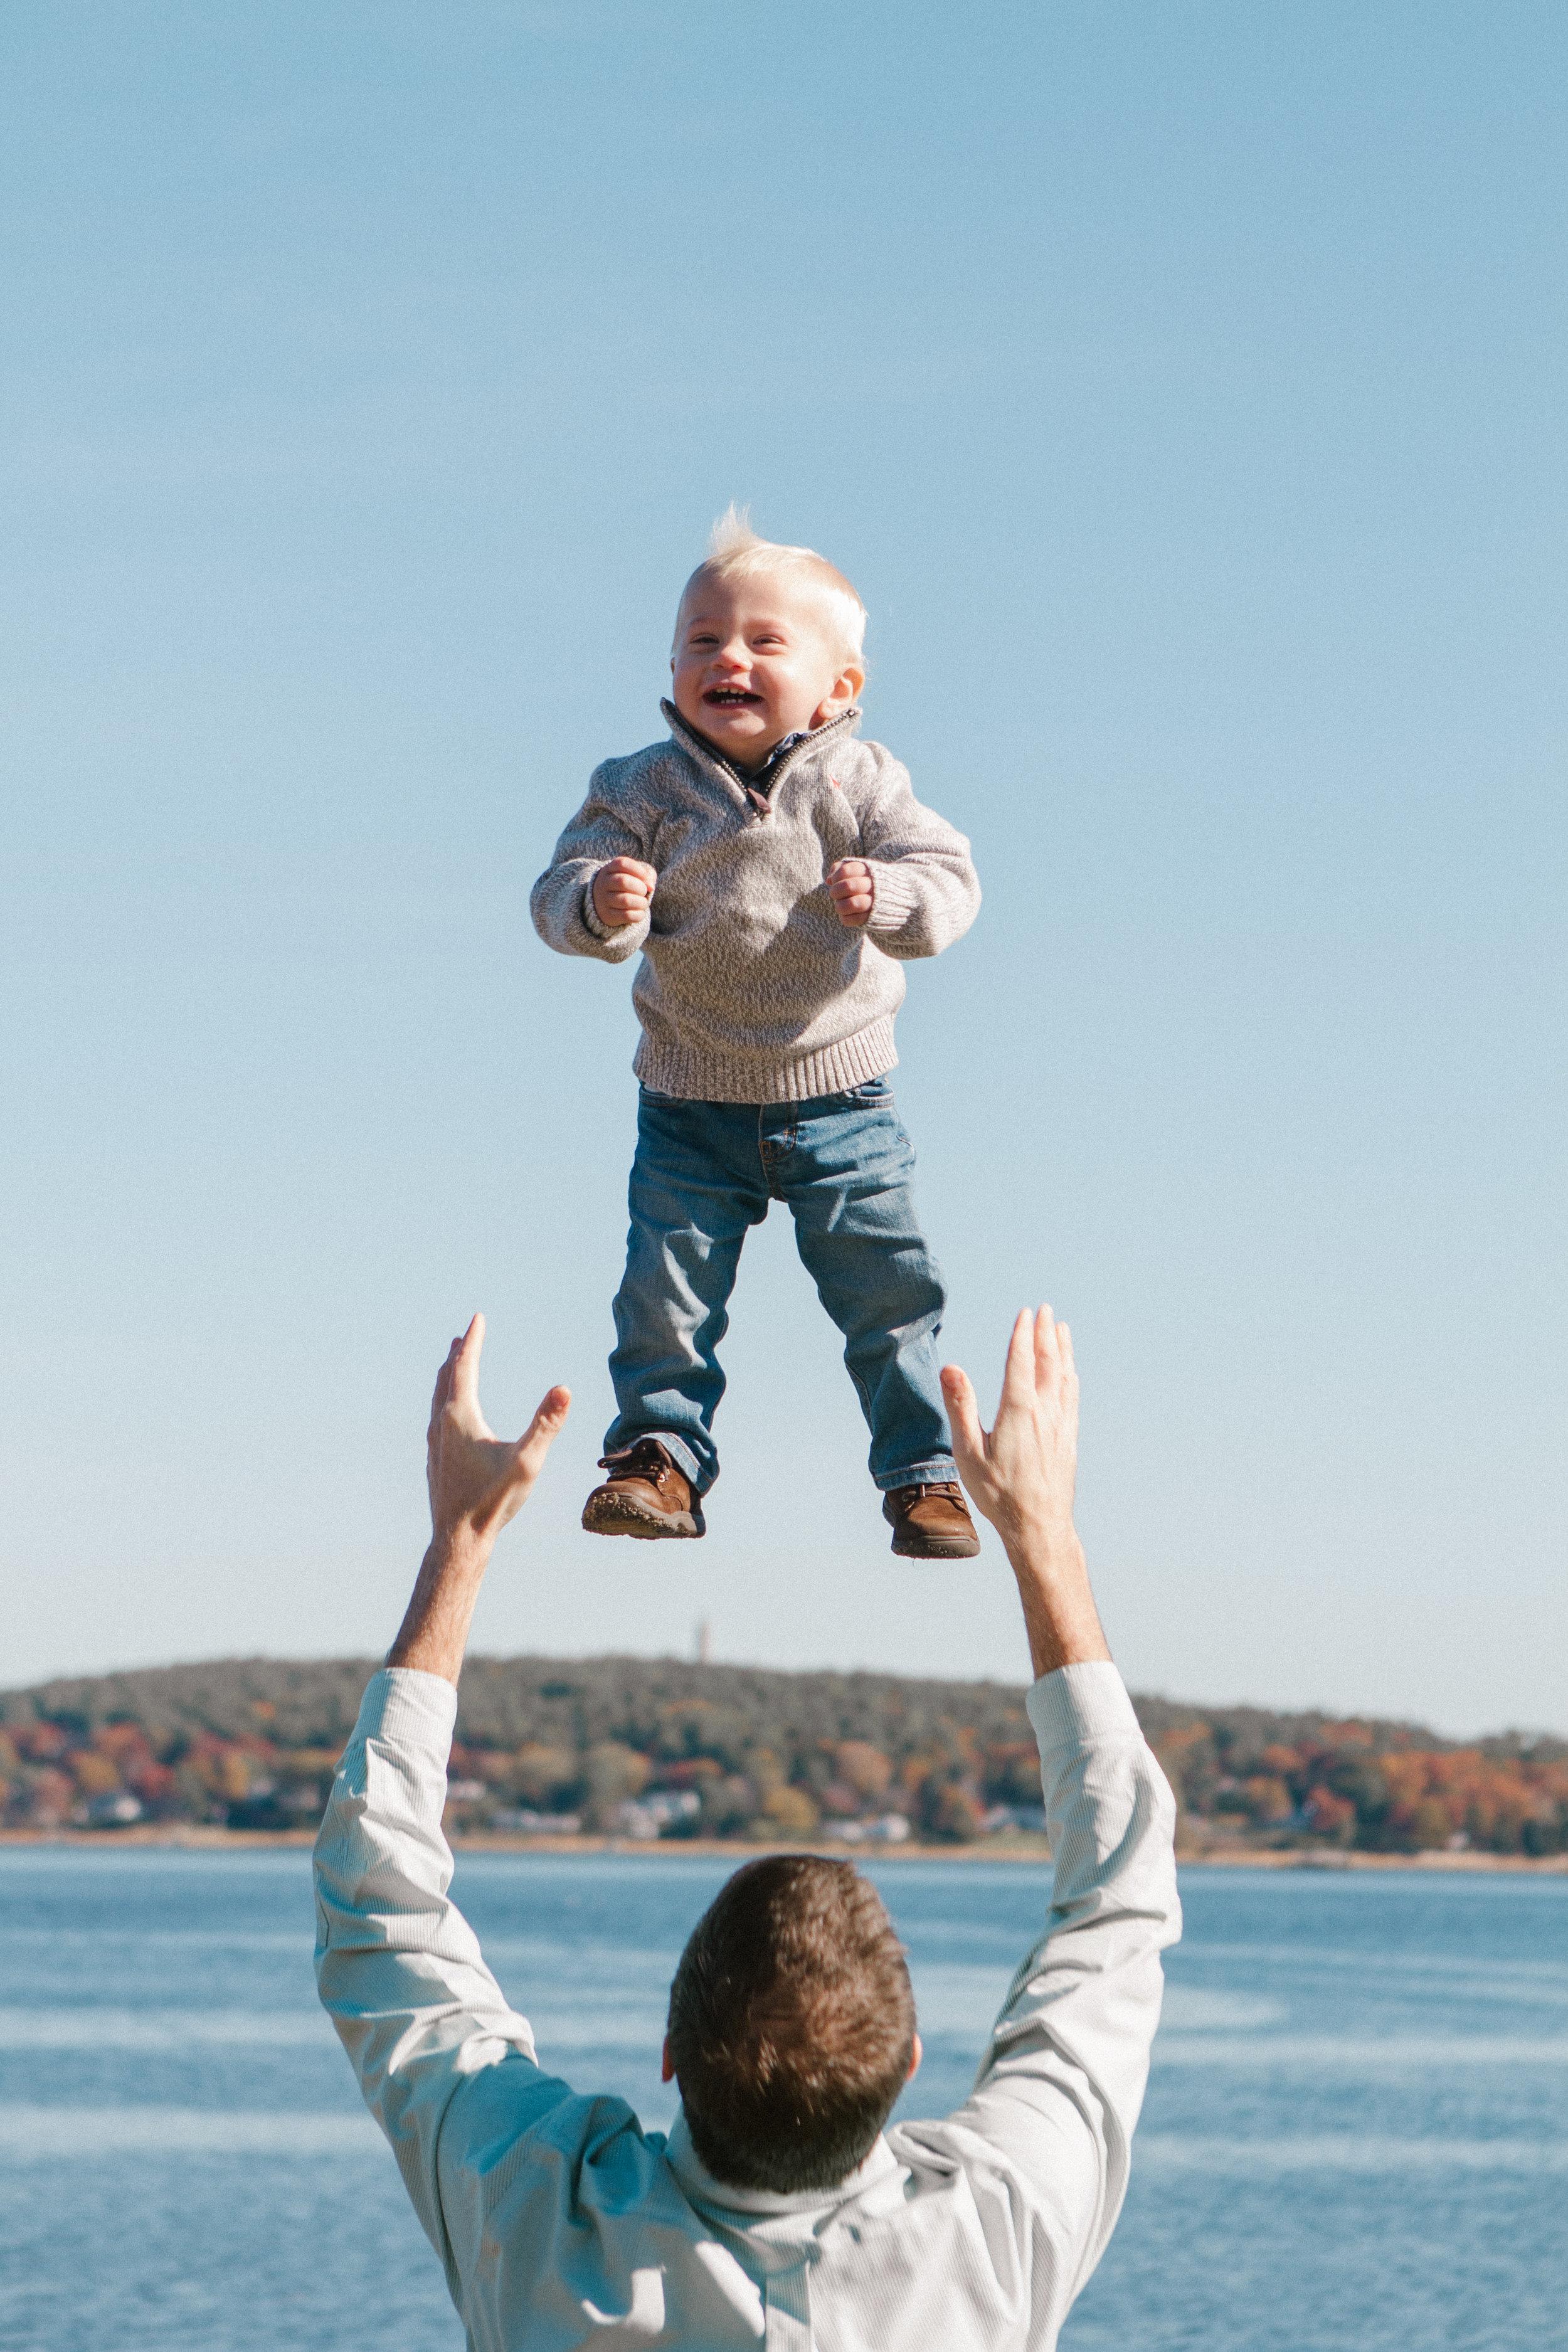 Duxbury Family Photographer, Duxbury Massachusetts, Scituate Massachusetts, Duxbury Bay, Bay Farm, Duxbury Beach, Shannon Sorensen Photography